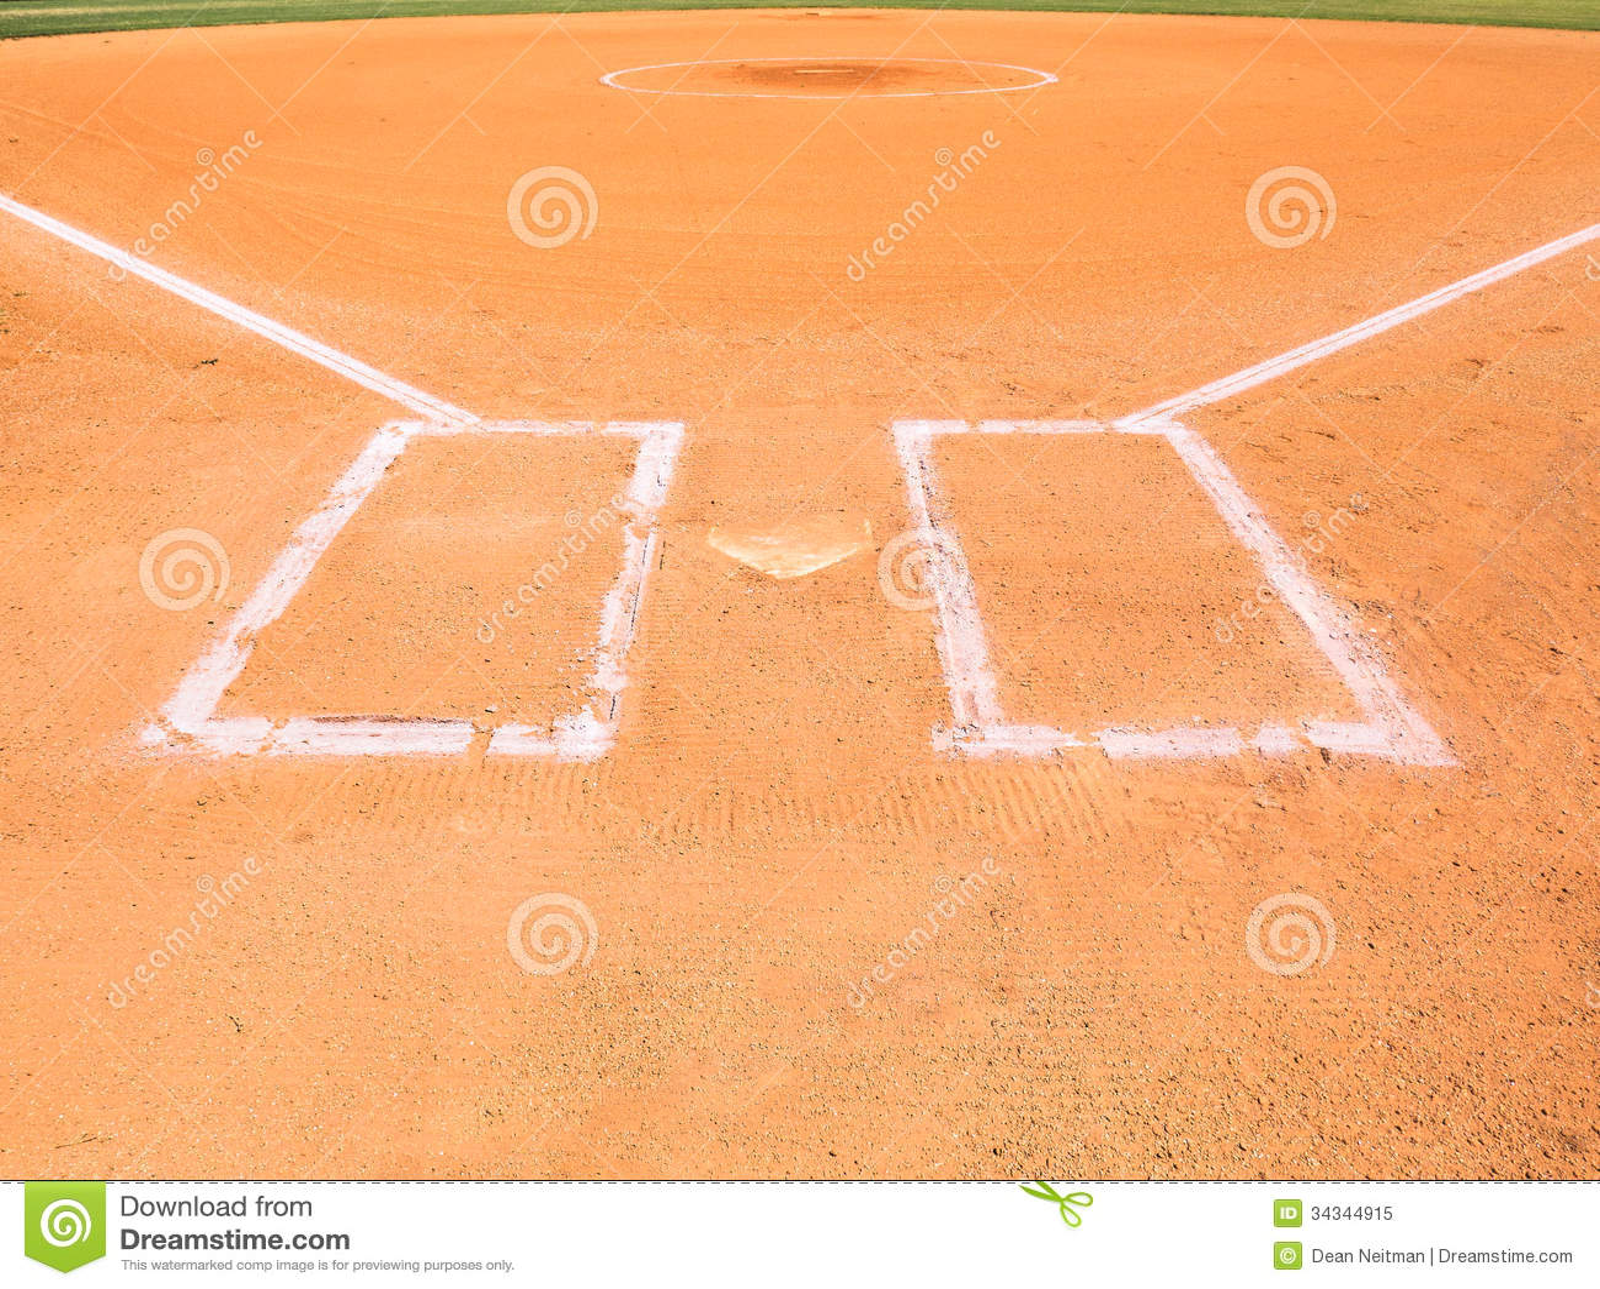 Baseballinfield